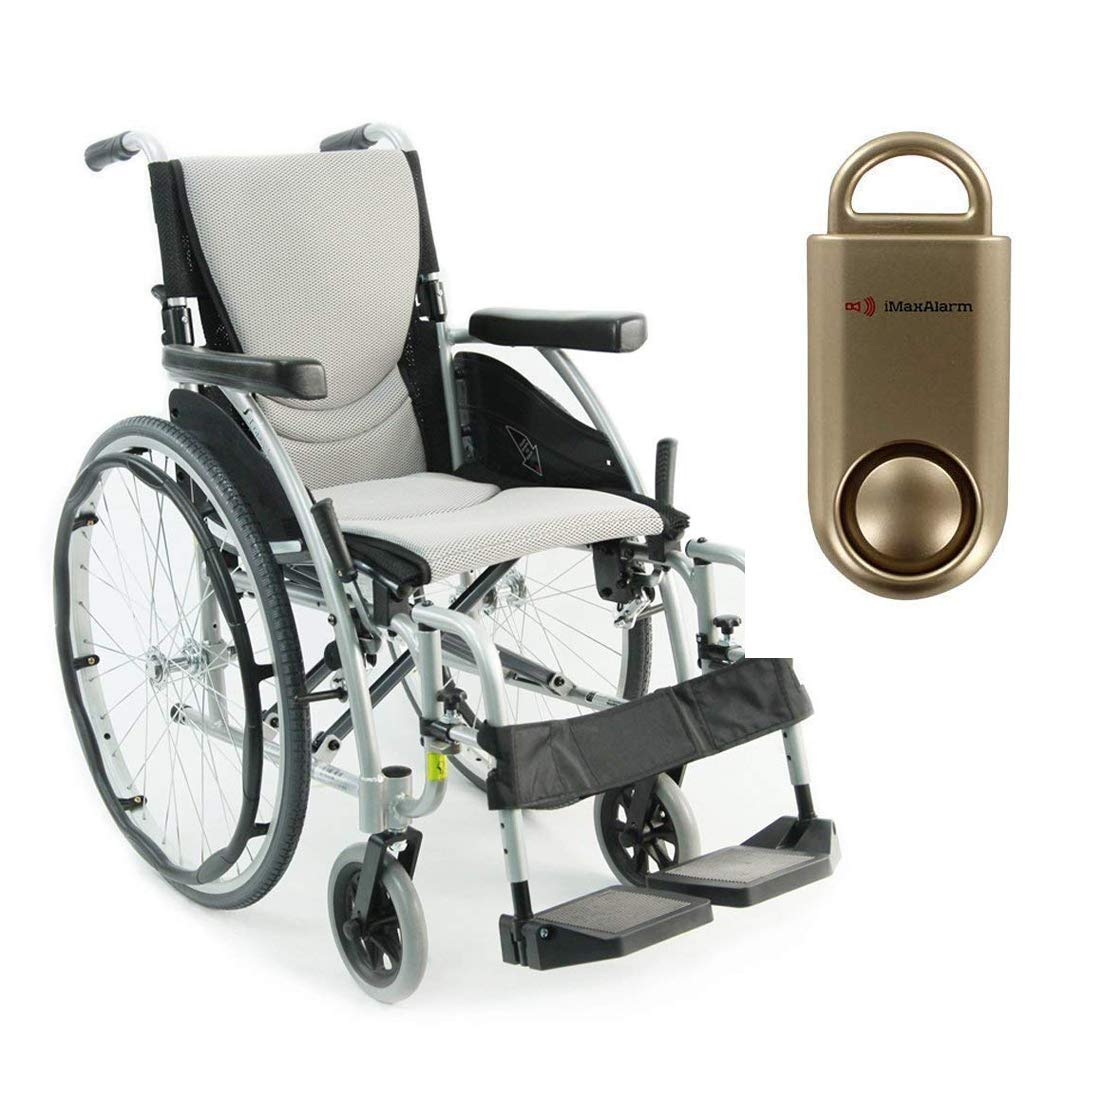 Karman S-Ergo 115 Ultra Low price Lightweight Seat New York Mall Ergonomic Wheelchair